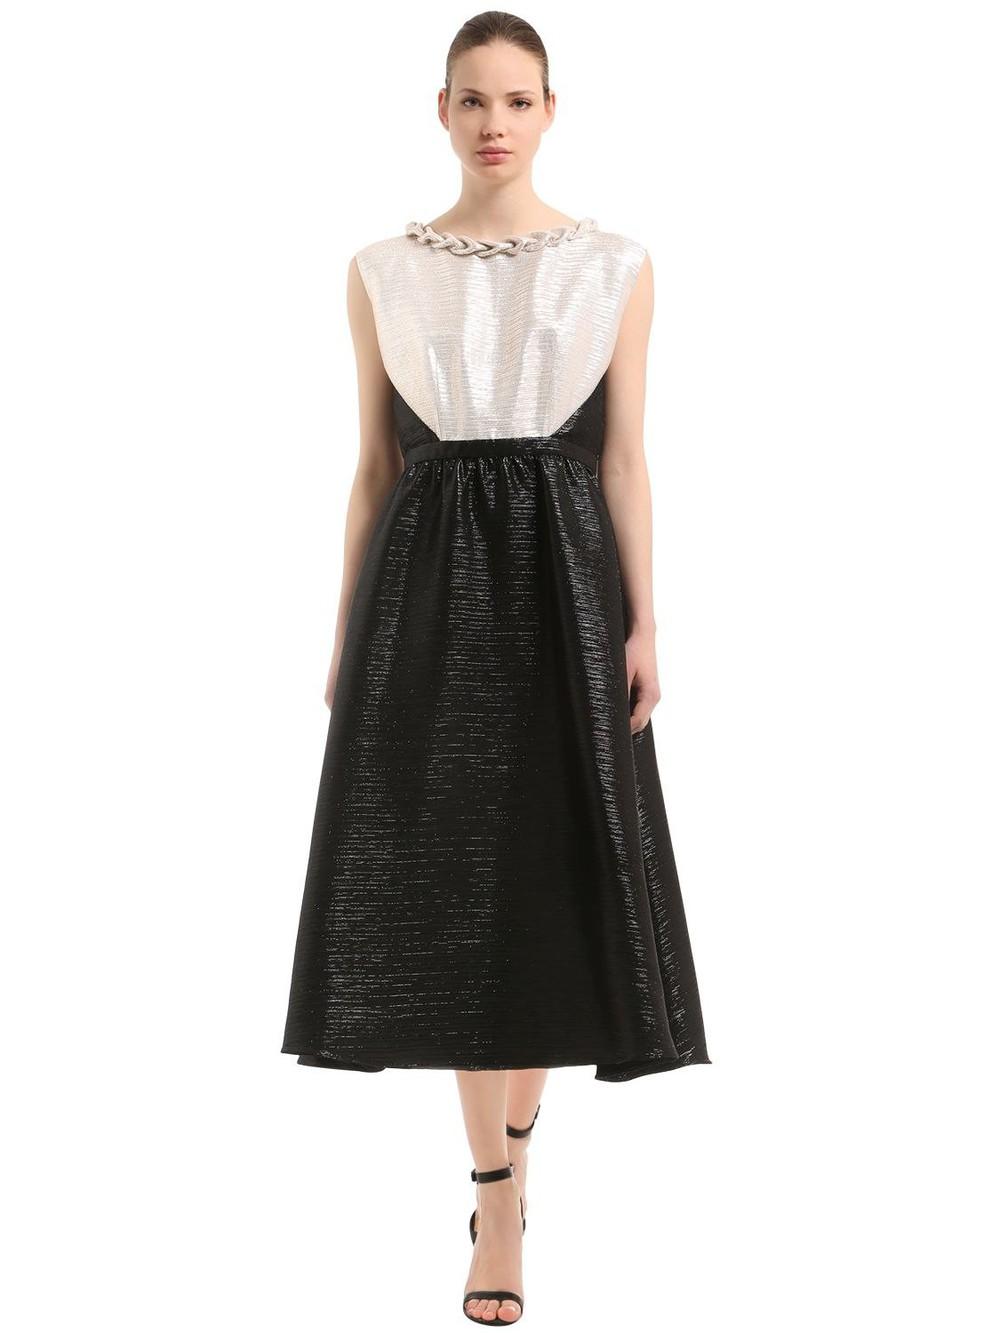 INGIE Two Tone Lamé Midi Dress in black / white